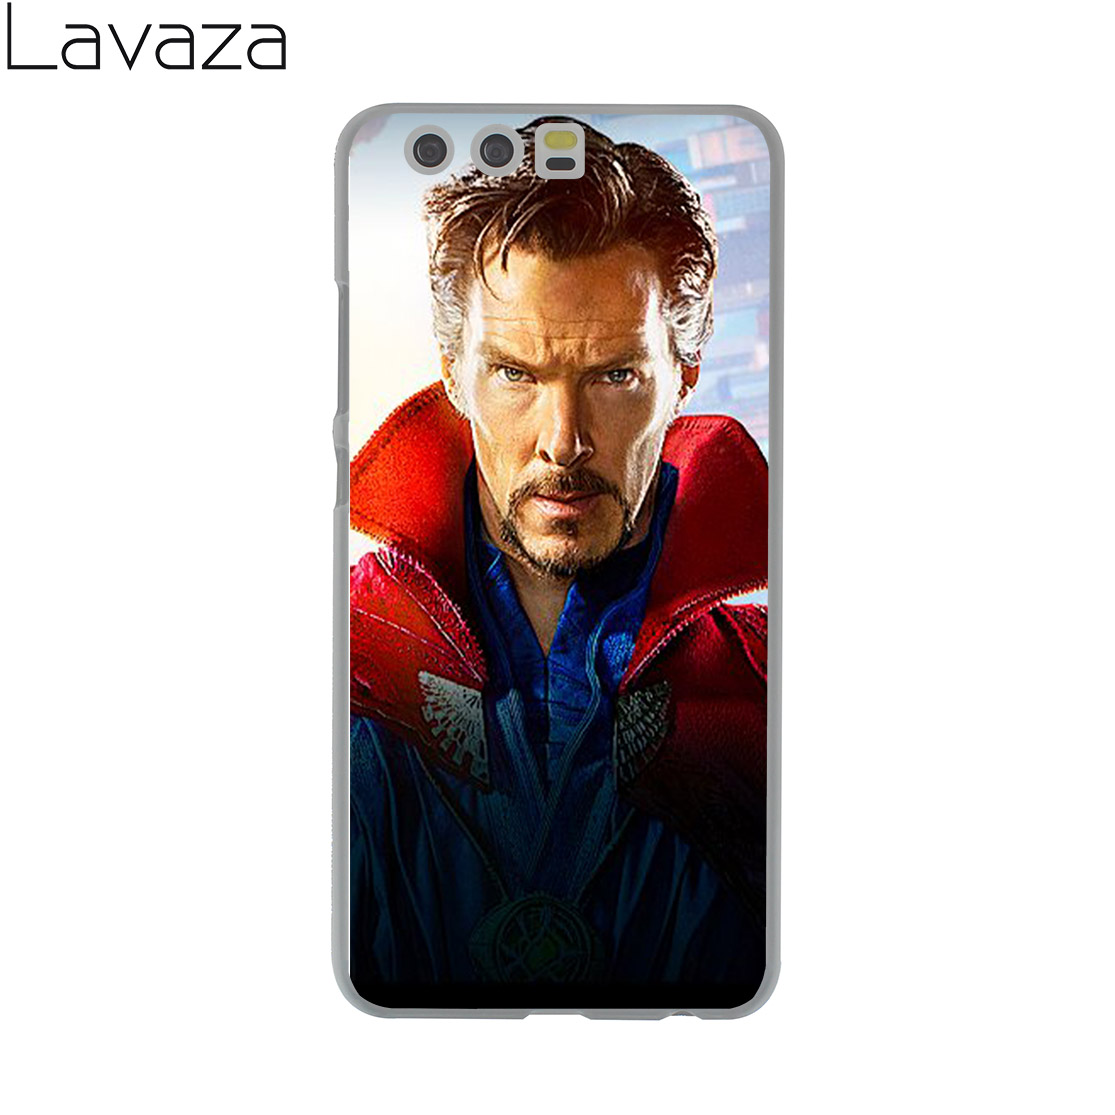 Half-wrapped Case Marvel Comics Doctor Strange For Huawei P20 P10 P9 P8 Pro Lite Plus Pro P Smart Mini Nova 3 3i Soft Mobile Phone Cover Case Phone Bags & Cases